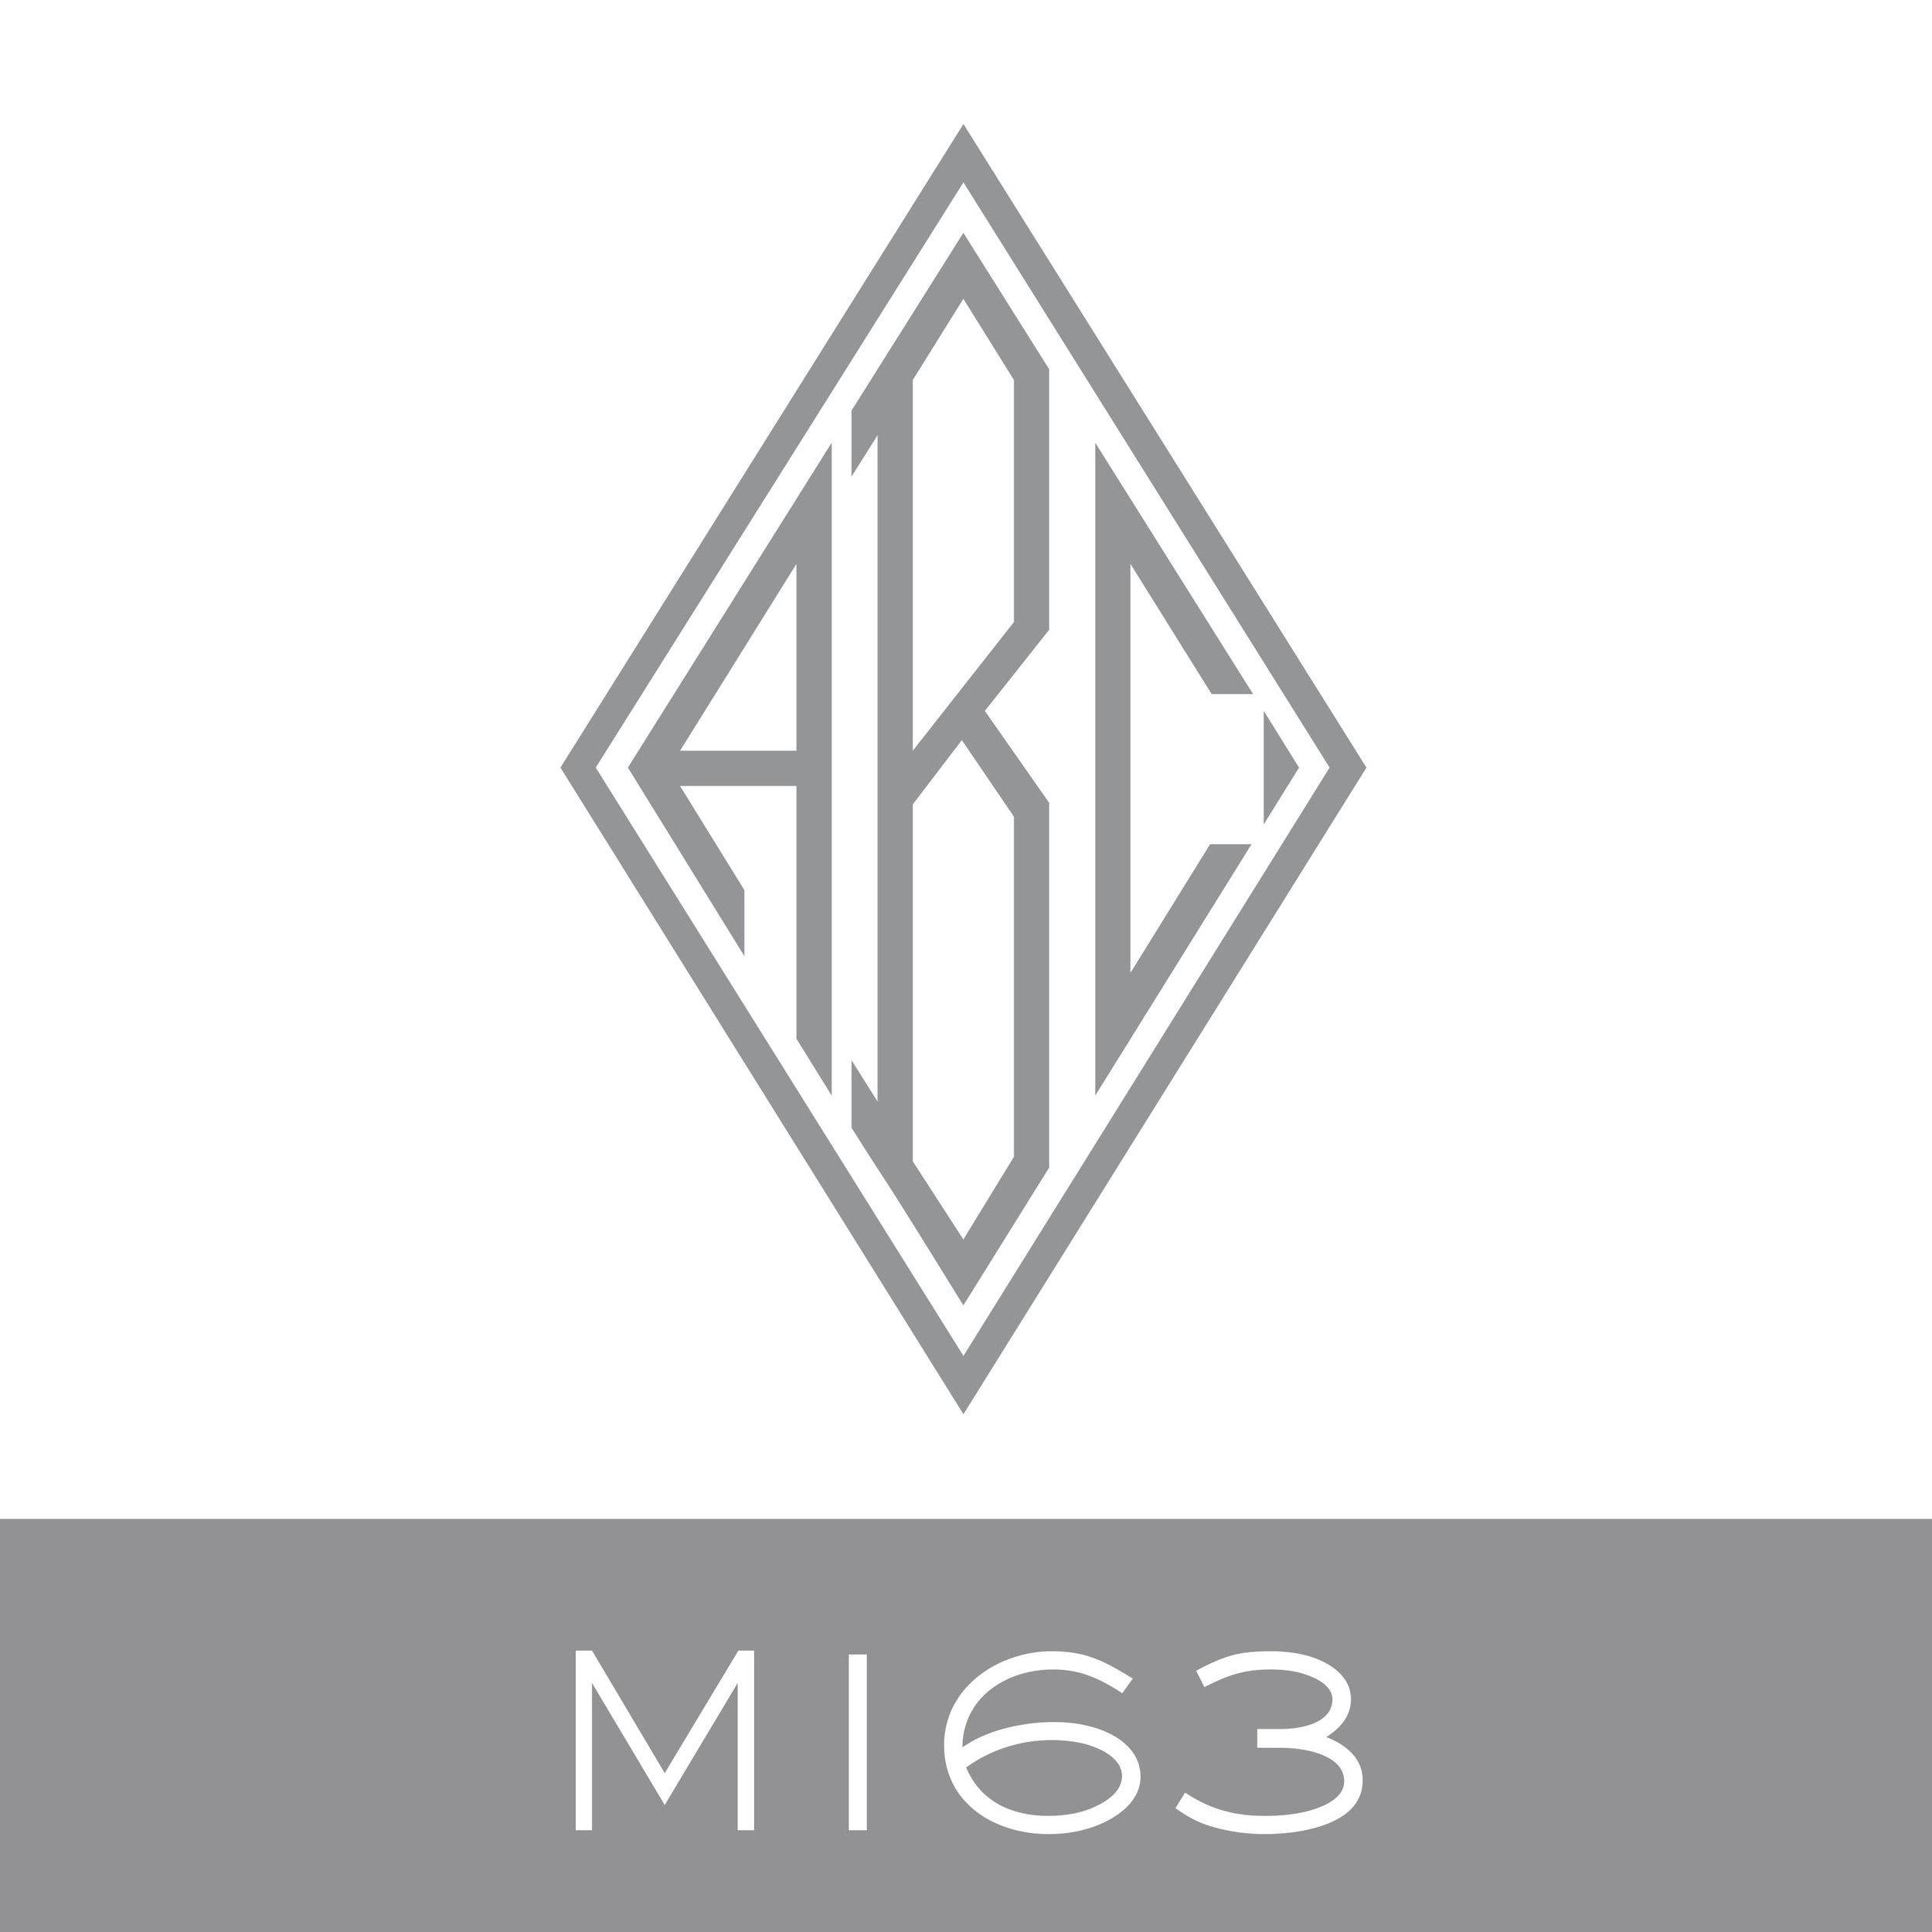 M163.jpg